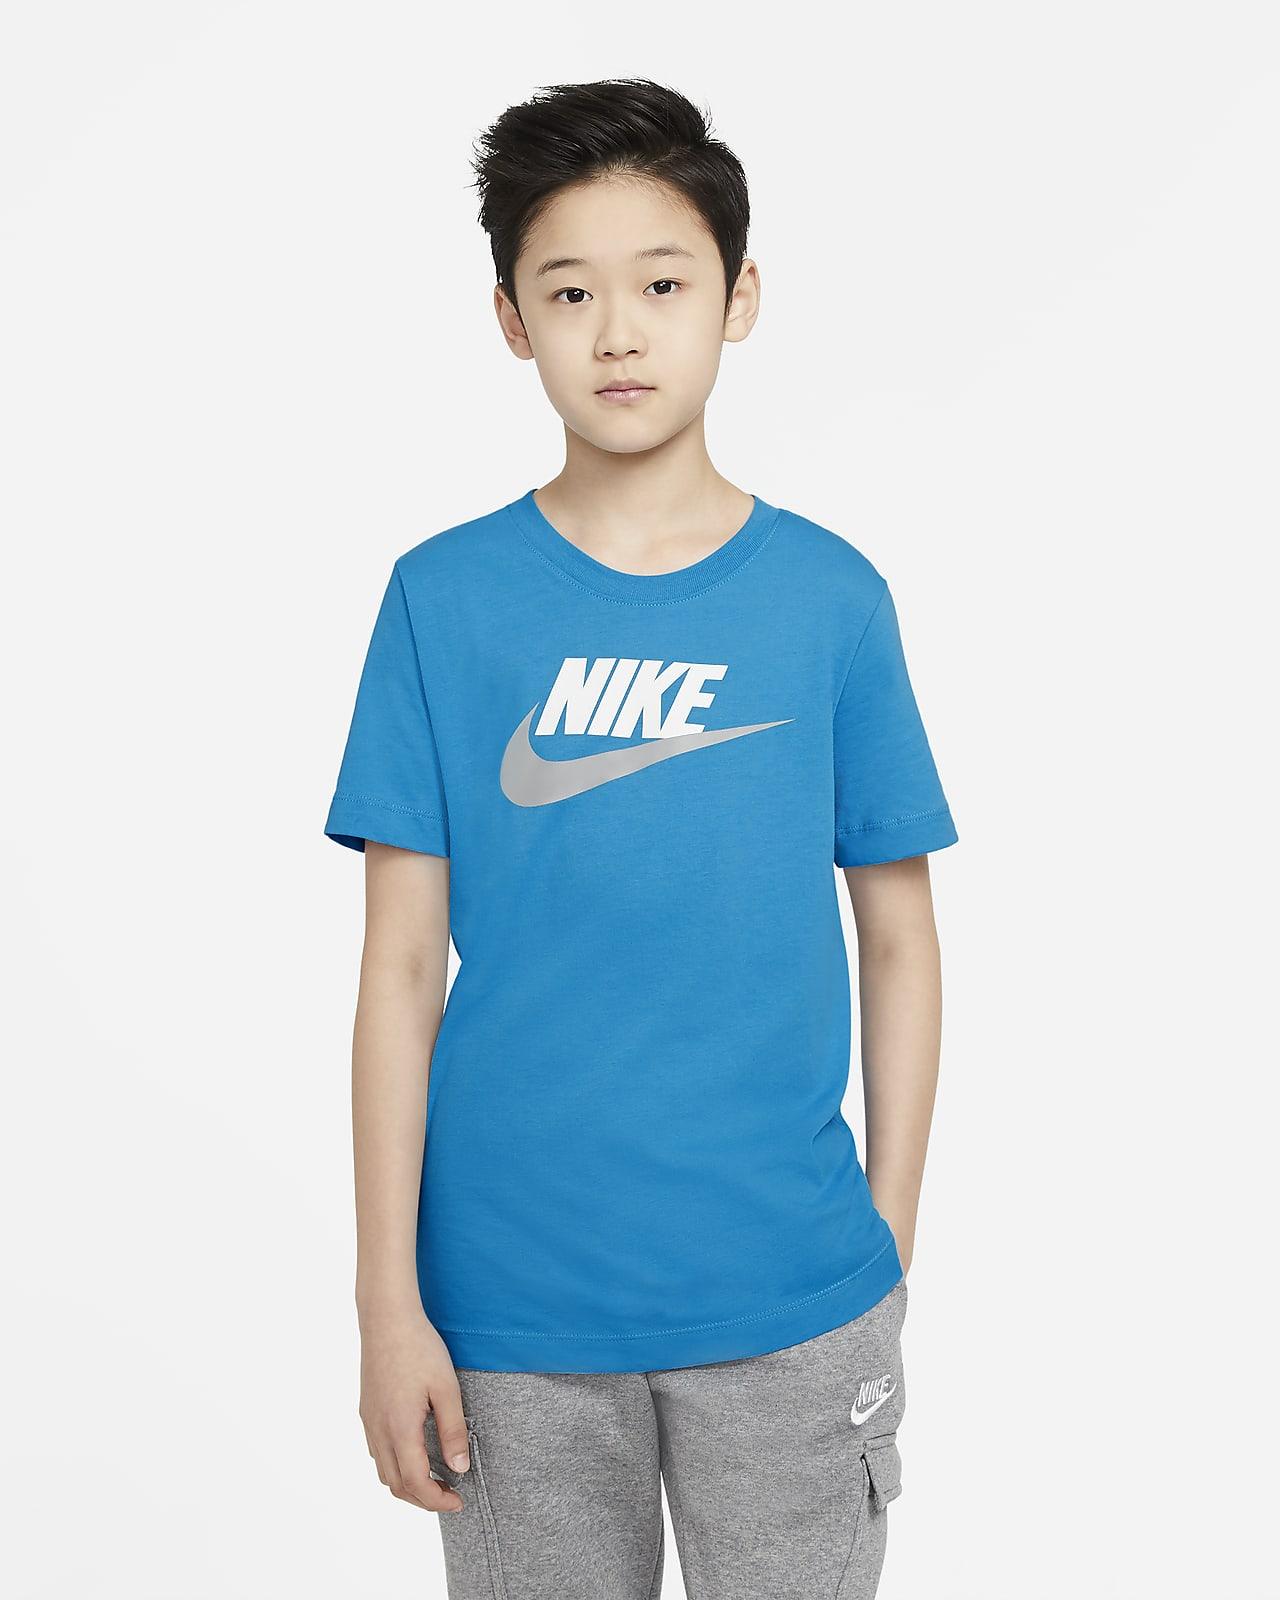 Tee-shirt en coton Nike Sportswear pour Enfant plus âgé